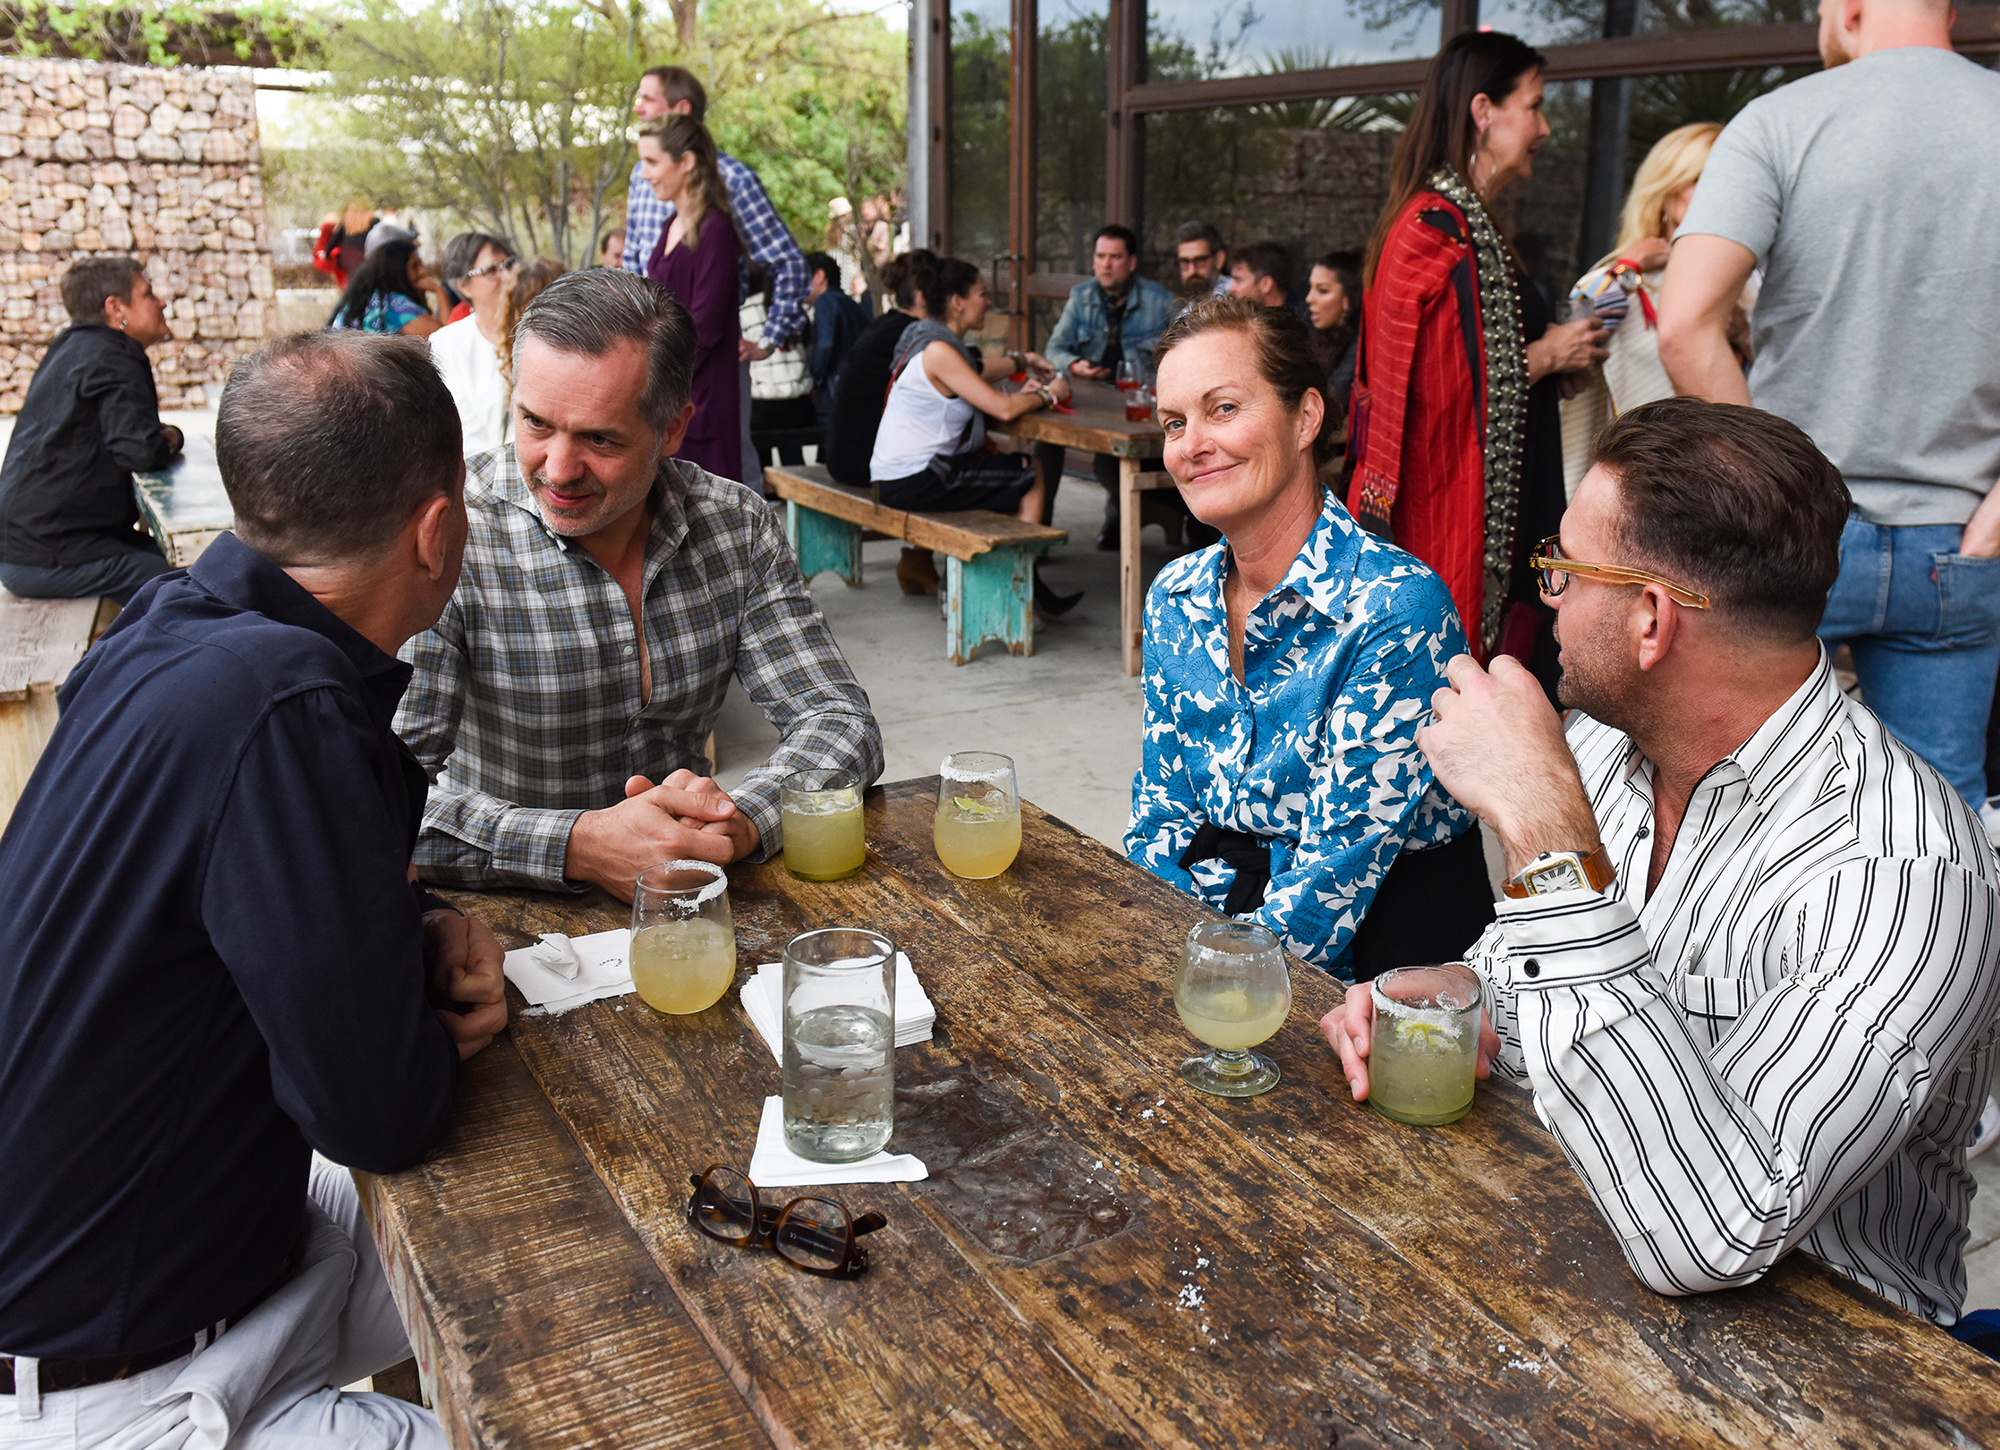 MI COCKTAIL RECEPTION + DINNER | THE CAPRI | MARFA  Jillian Spark